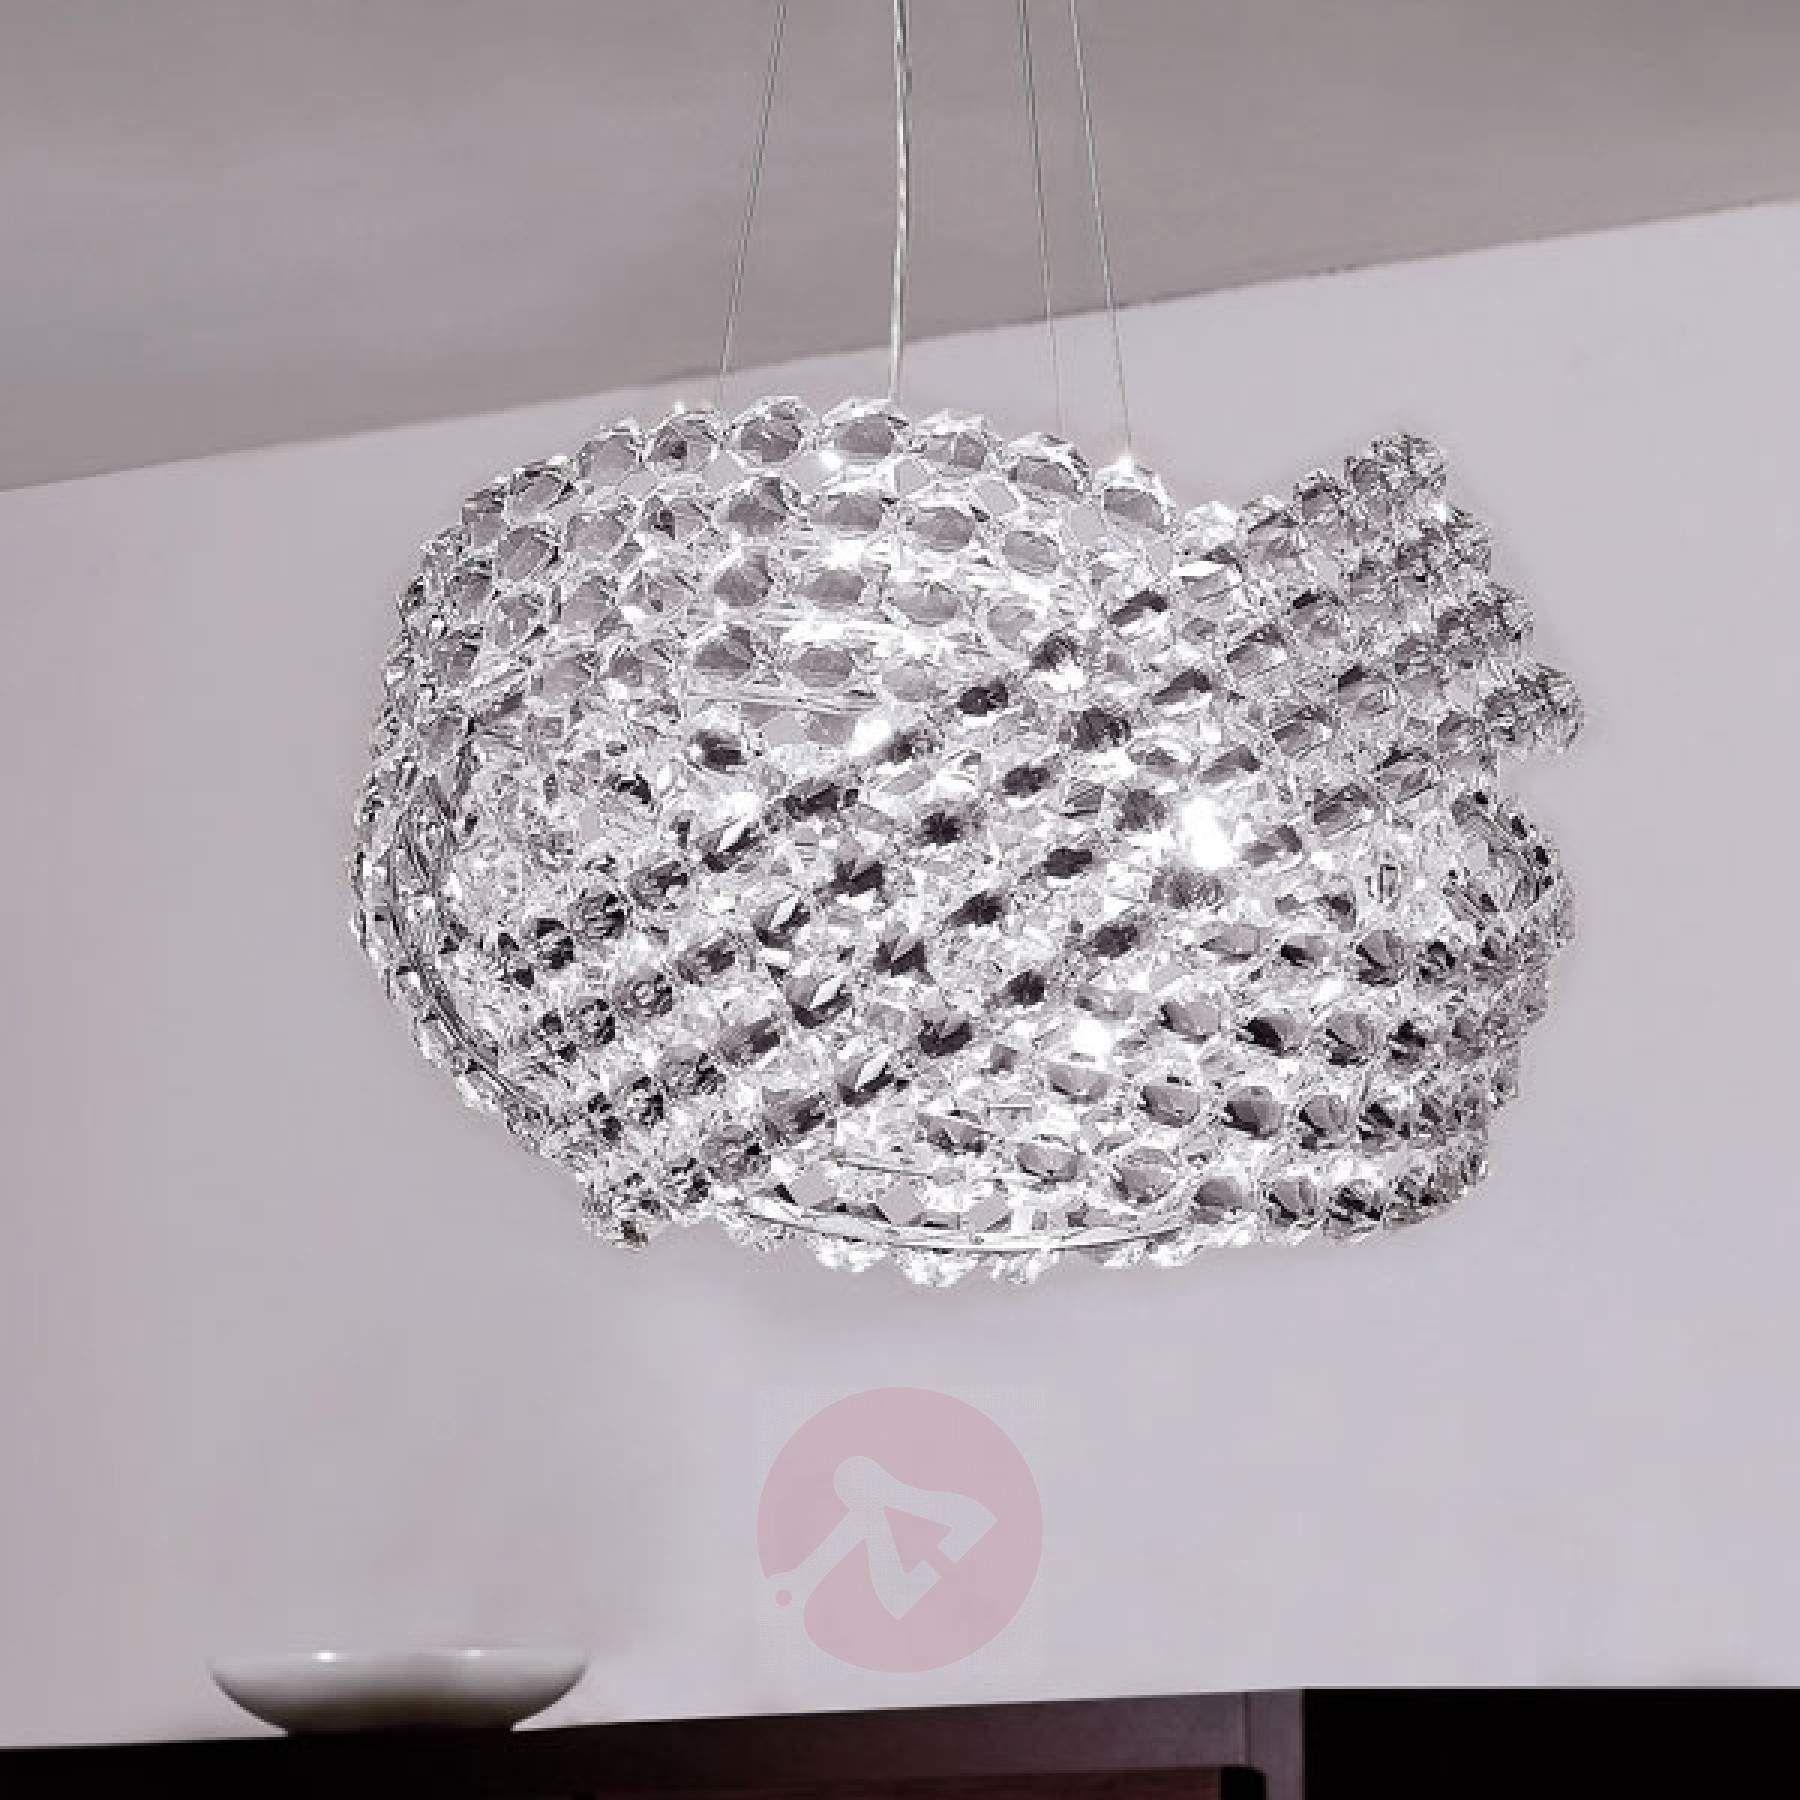 Kristall Pendelleuchte Diamante Ø 40 cm | Pendelleuchte